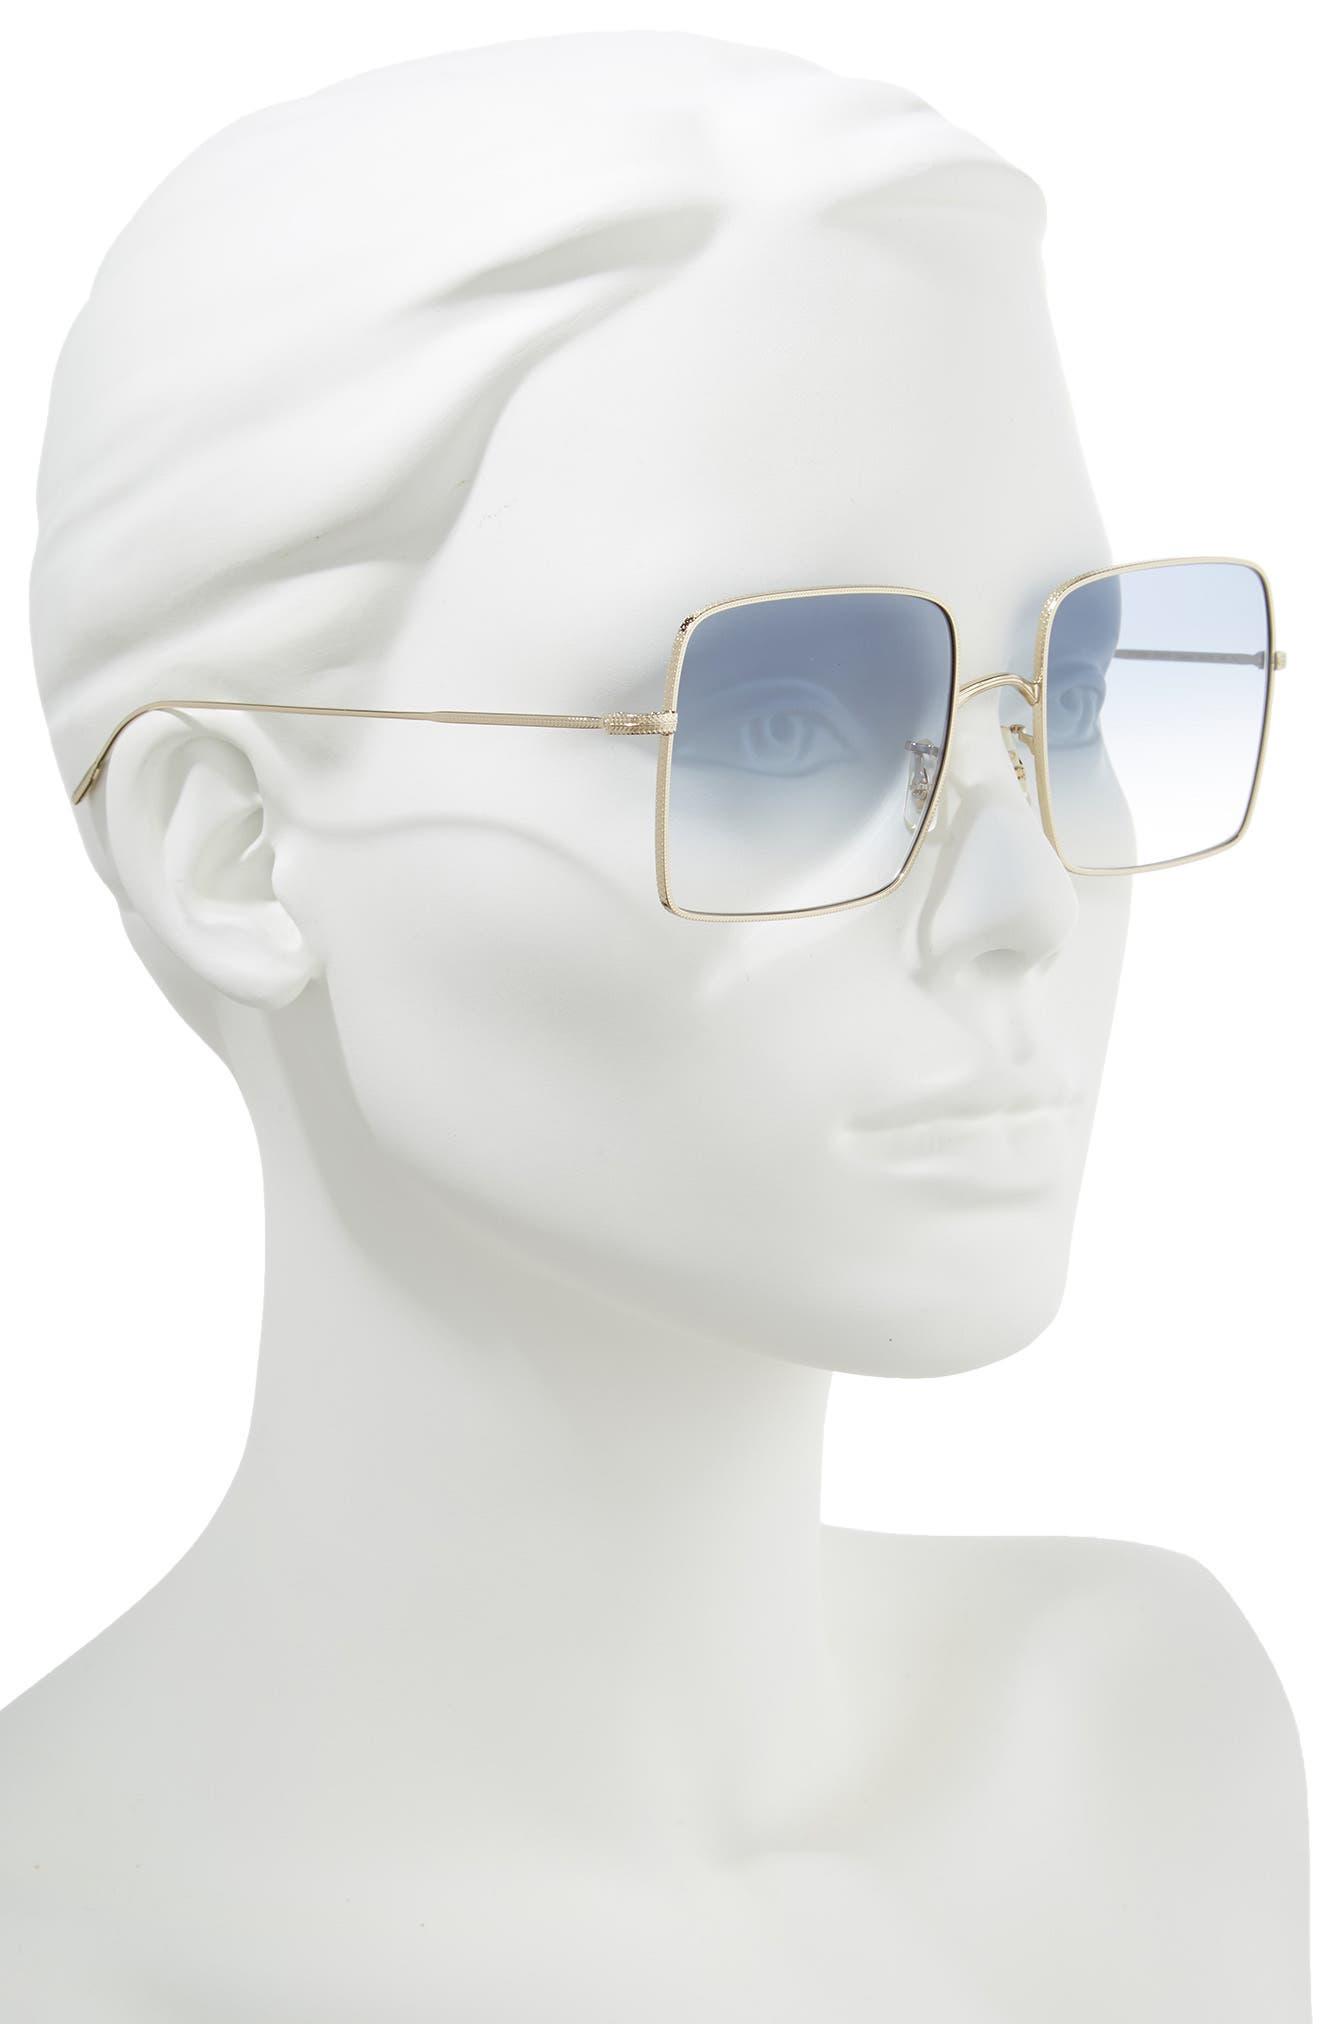 Rassine 56mm Sunglasses,                             Alternate thumbnail 2, color,                             Soft Gold Blue